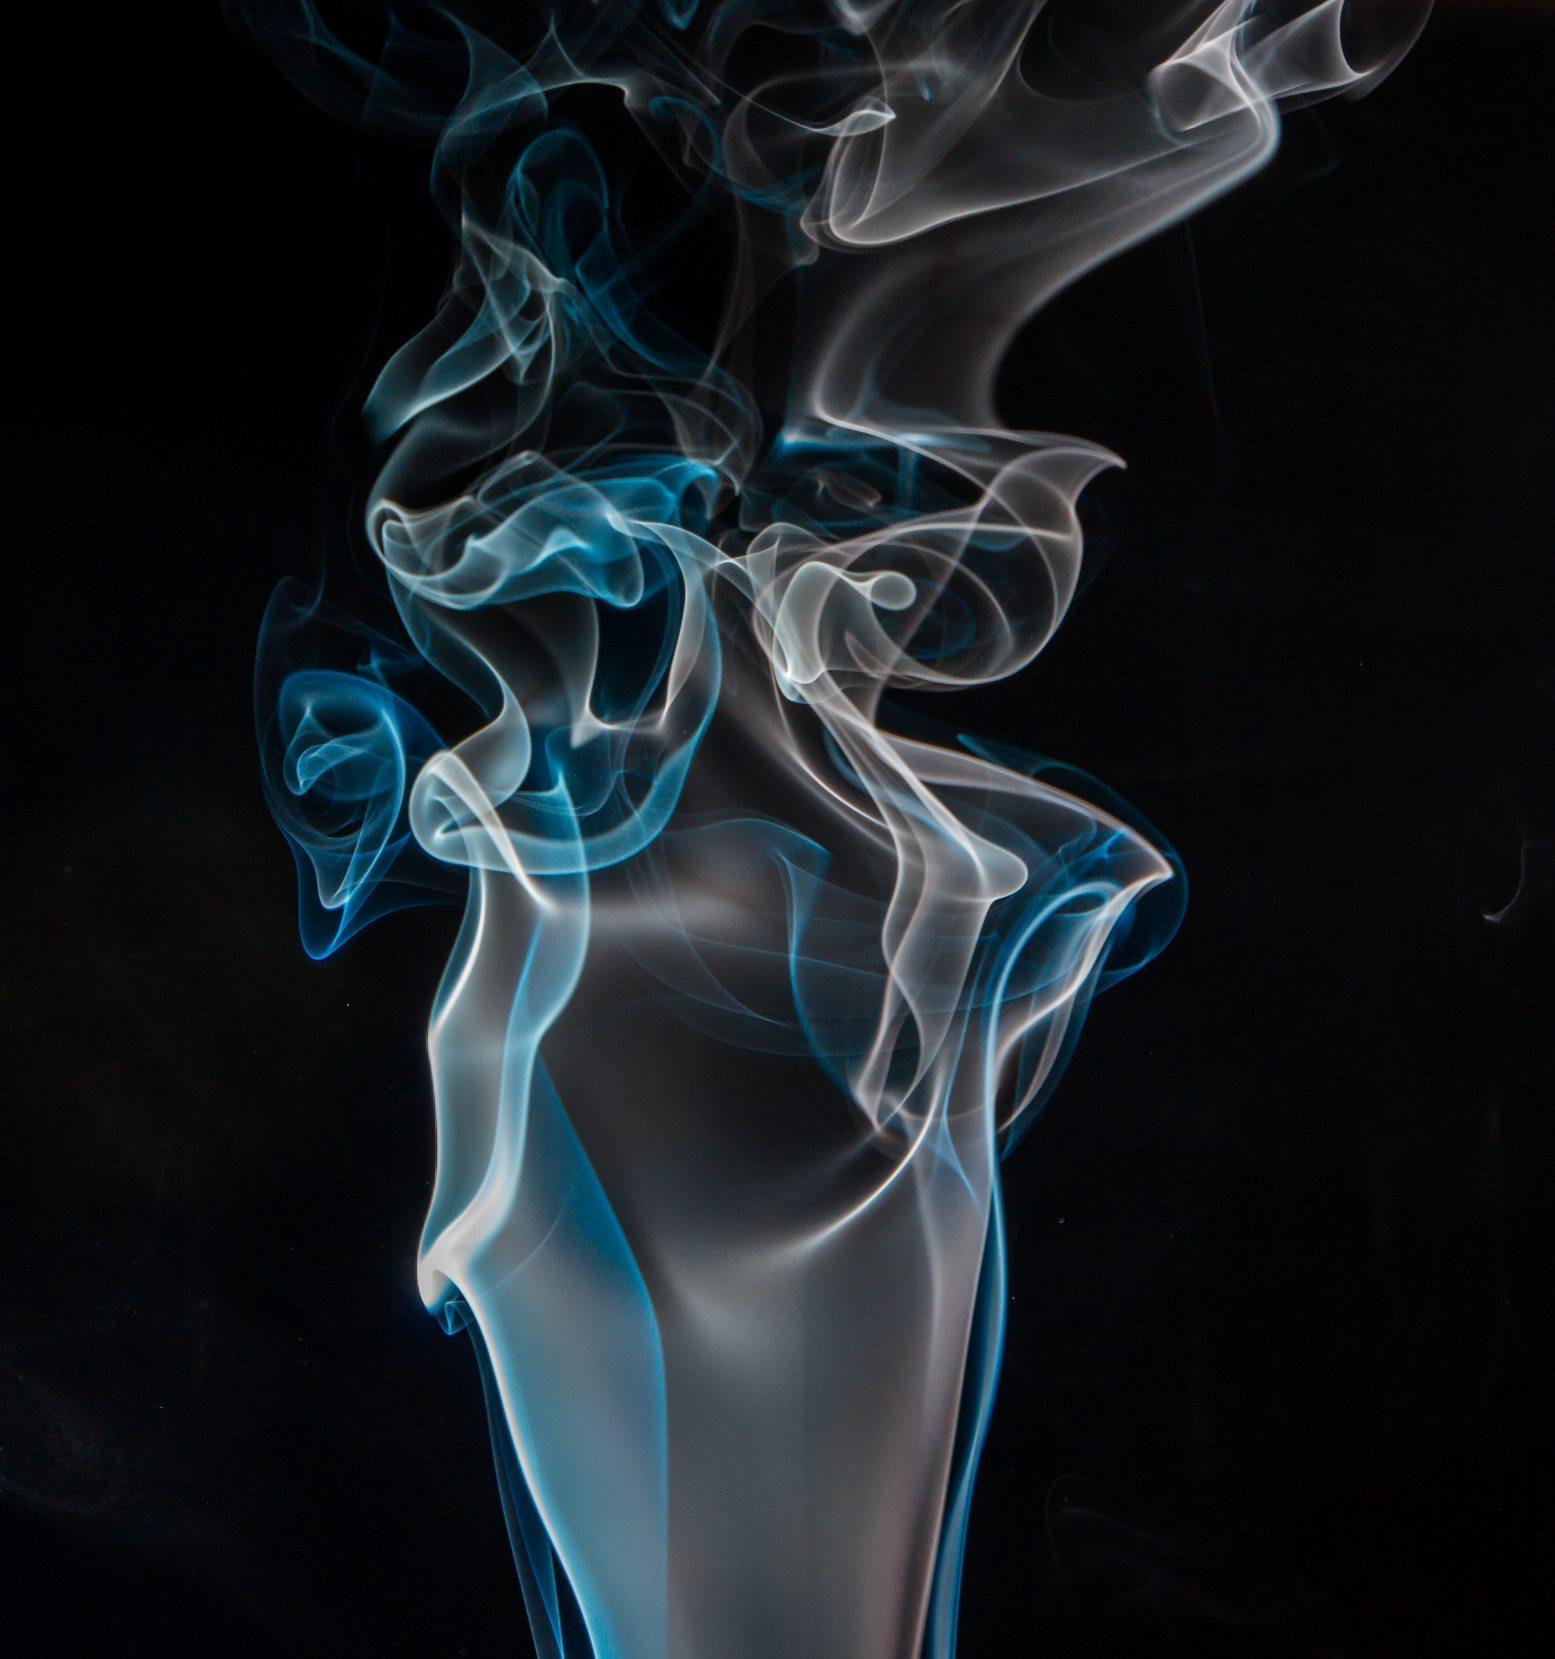 black wallpaper blue and white smoke